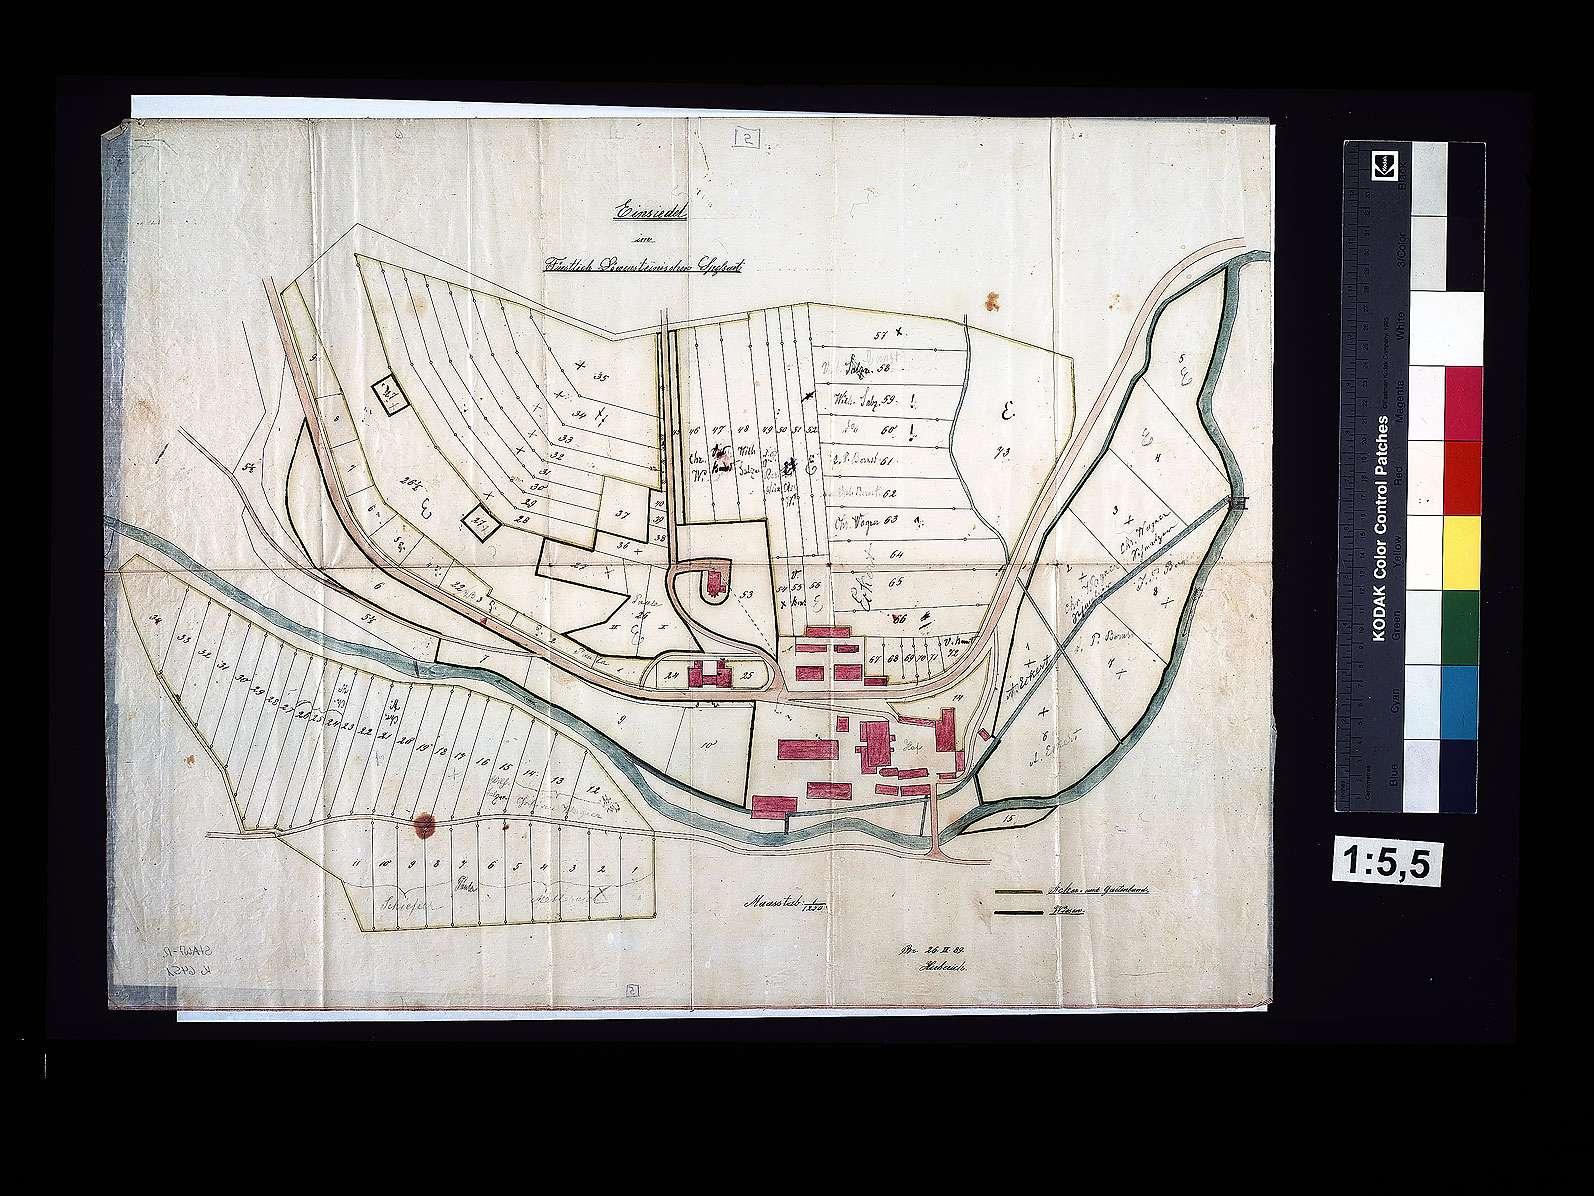 Topographische Karte des Großherzogtums Baden 1:25.000. Blatt Schlossau, Bild 1